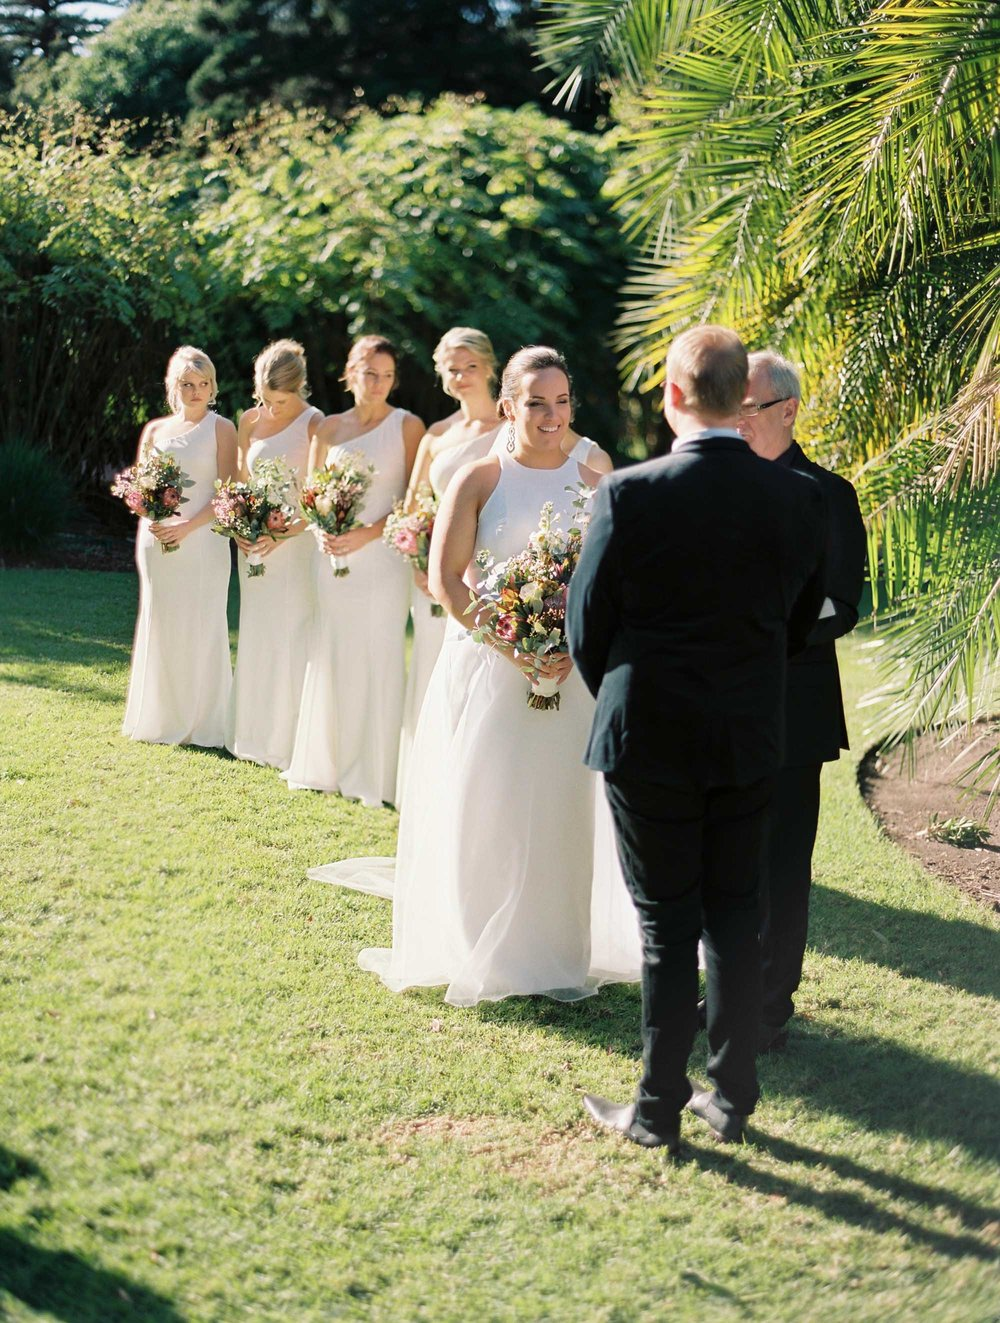 Botanic-Gardens-Ten22-wedding-photography-036.jpg